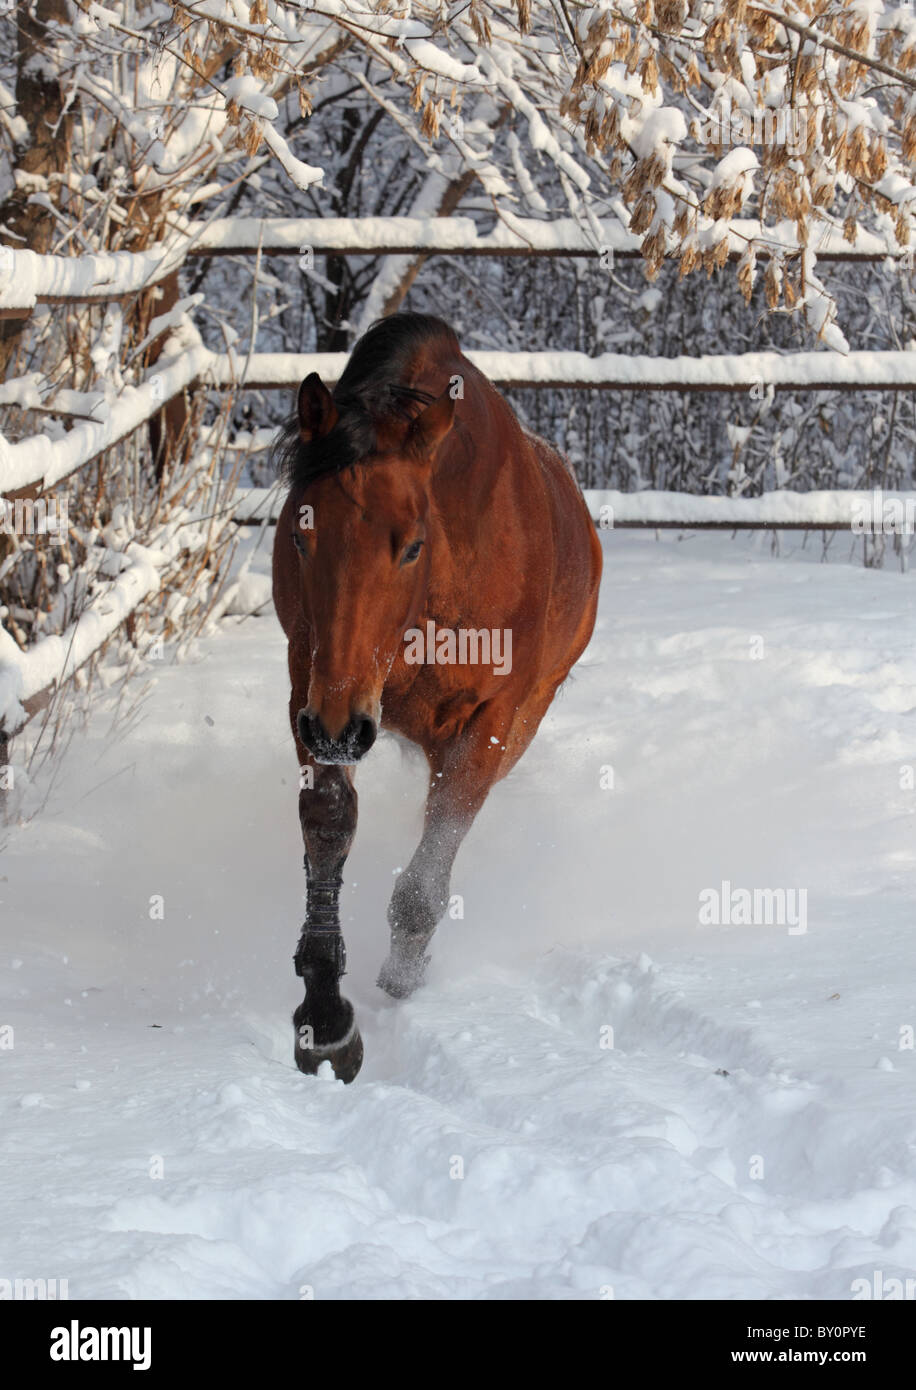 Skipping sorrel horse in winter ranch - Stock Image